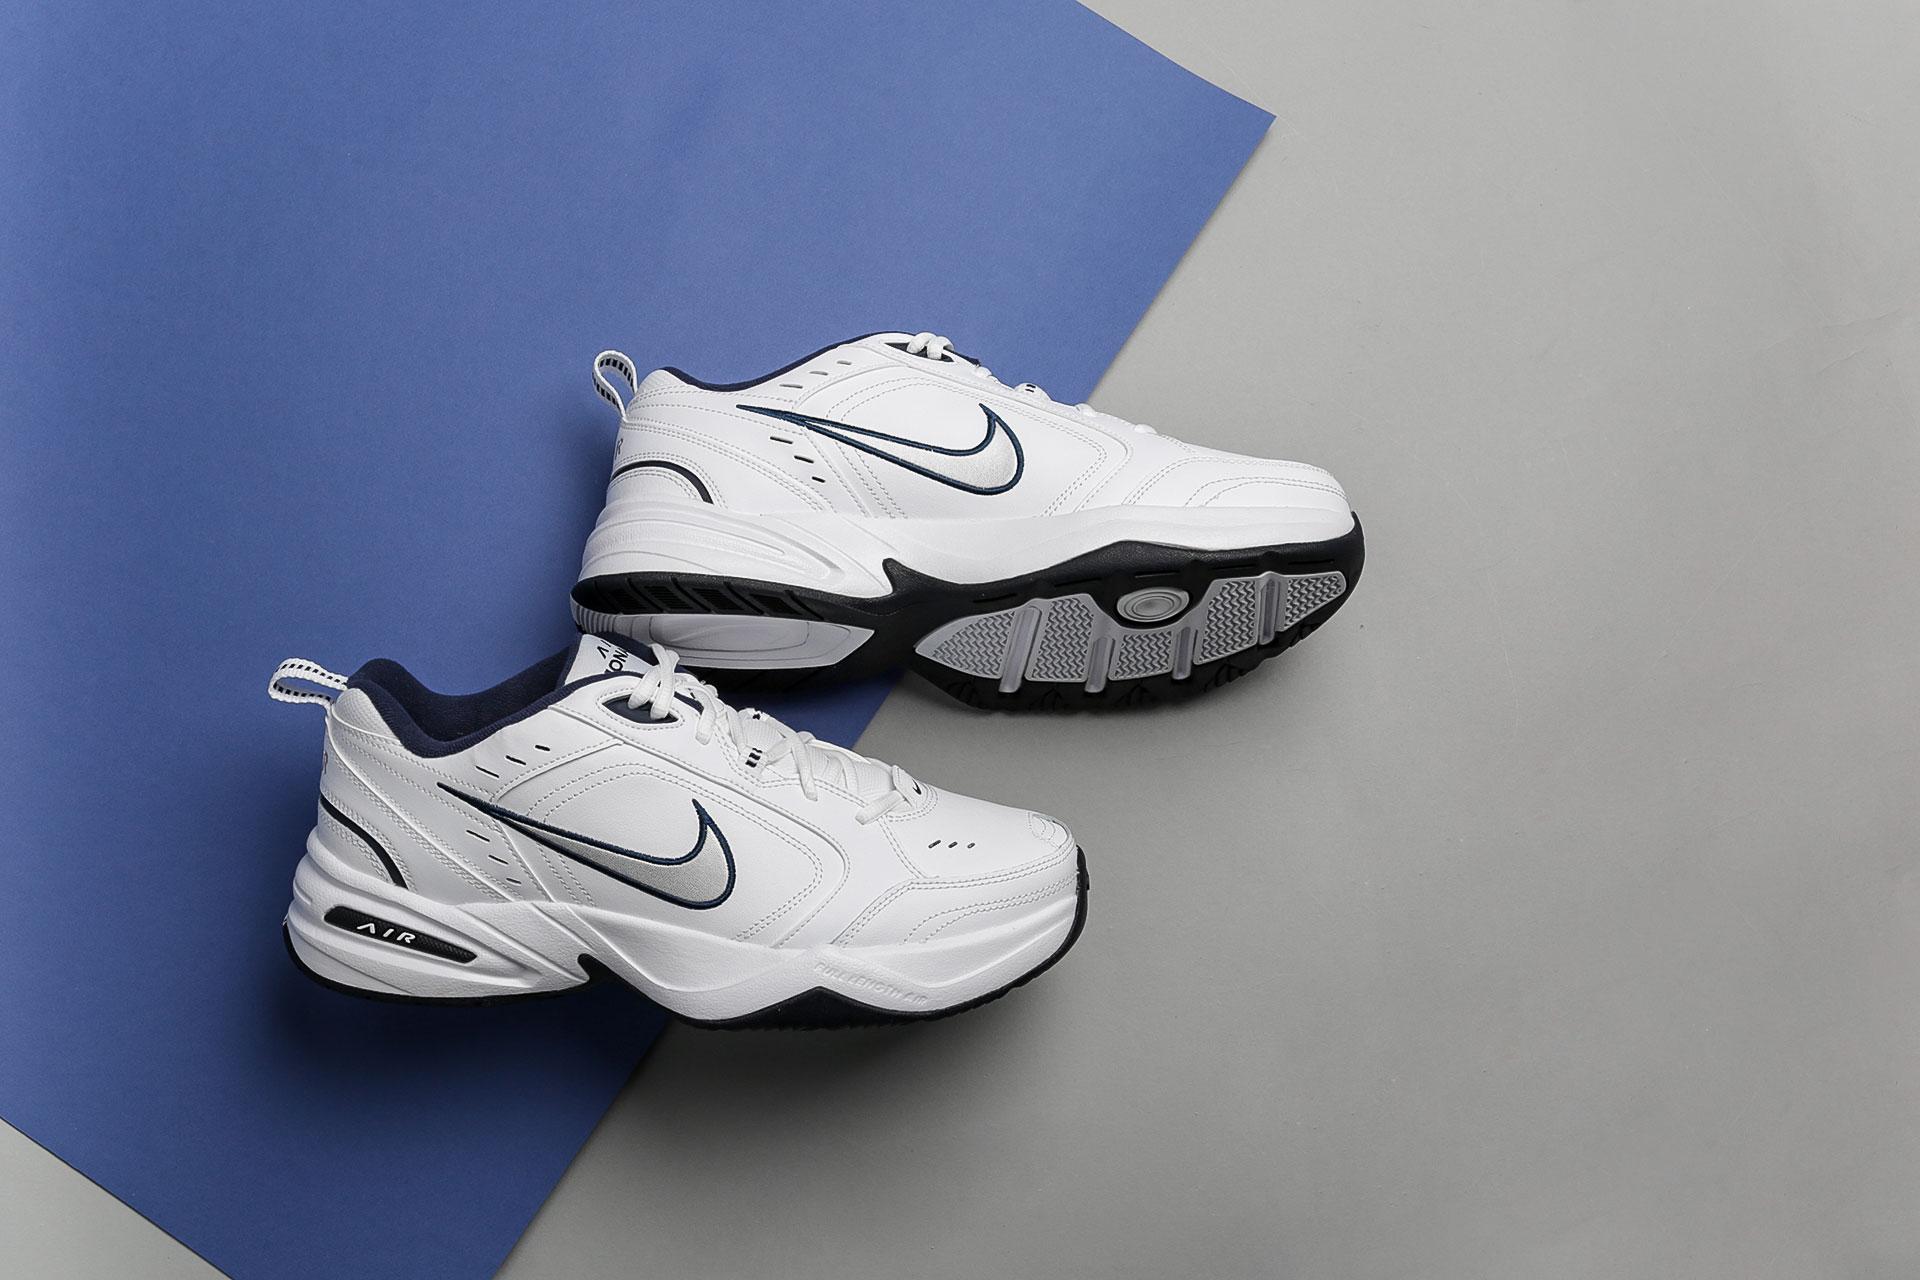 e1dcf883 Купить белые мужские кроссовки Air Monarch IV от Nike (415445-102 ...